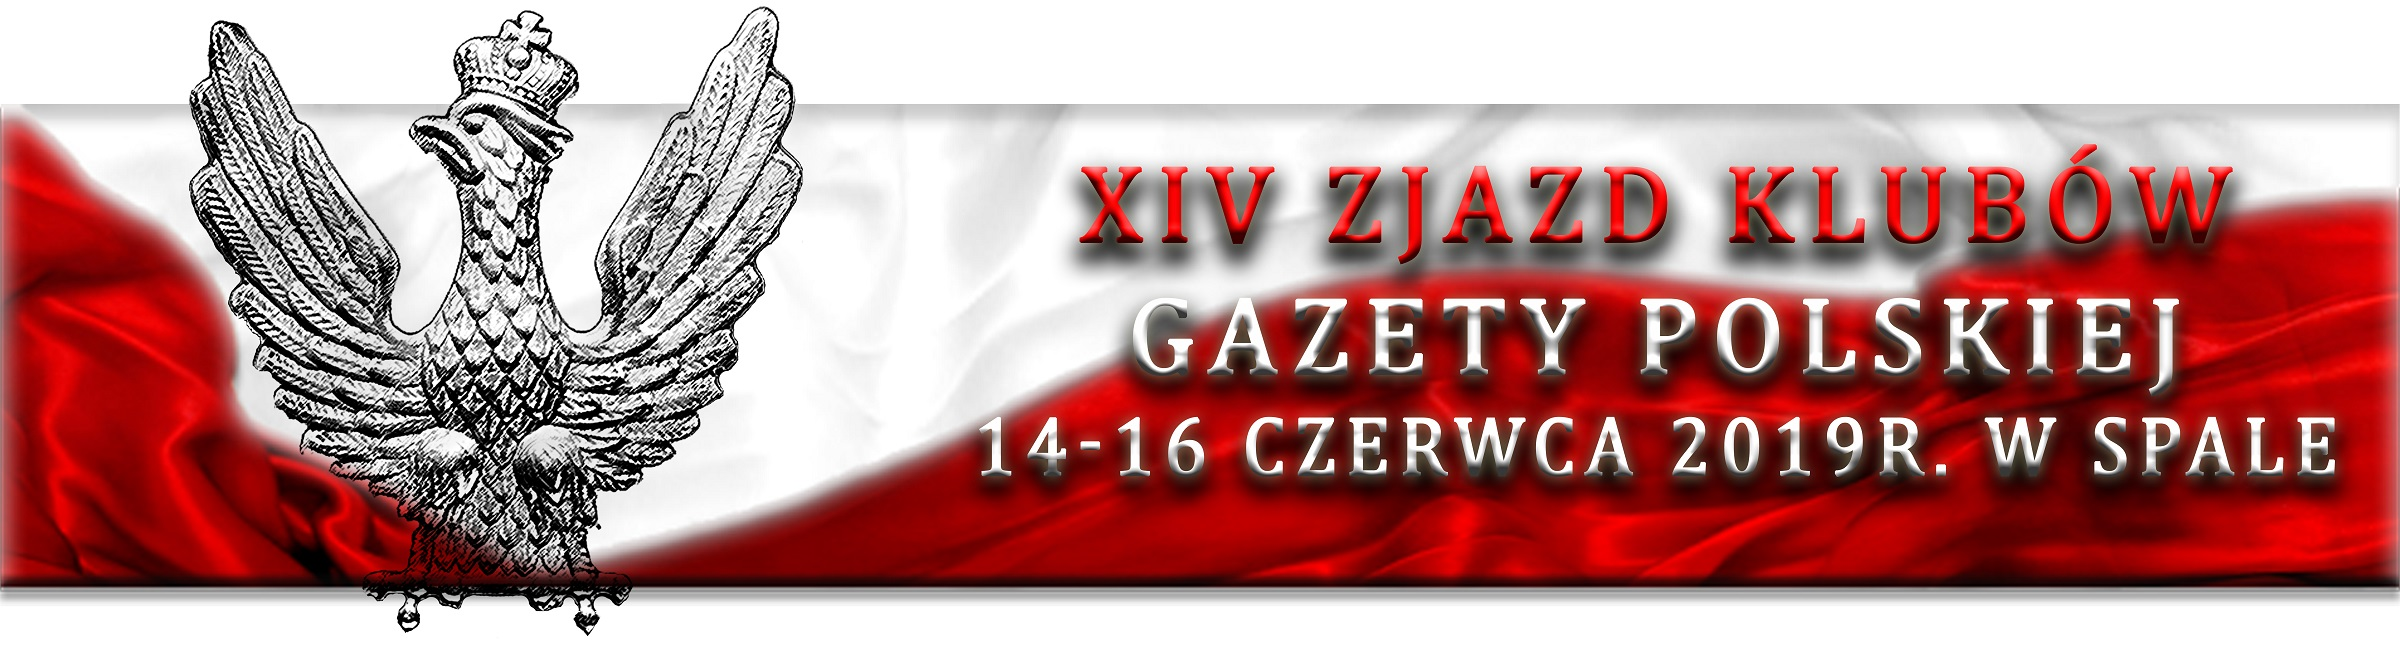 bannerGP_Zjazd2019_small